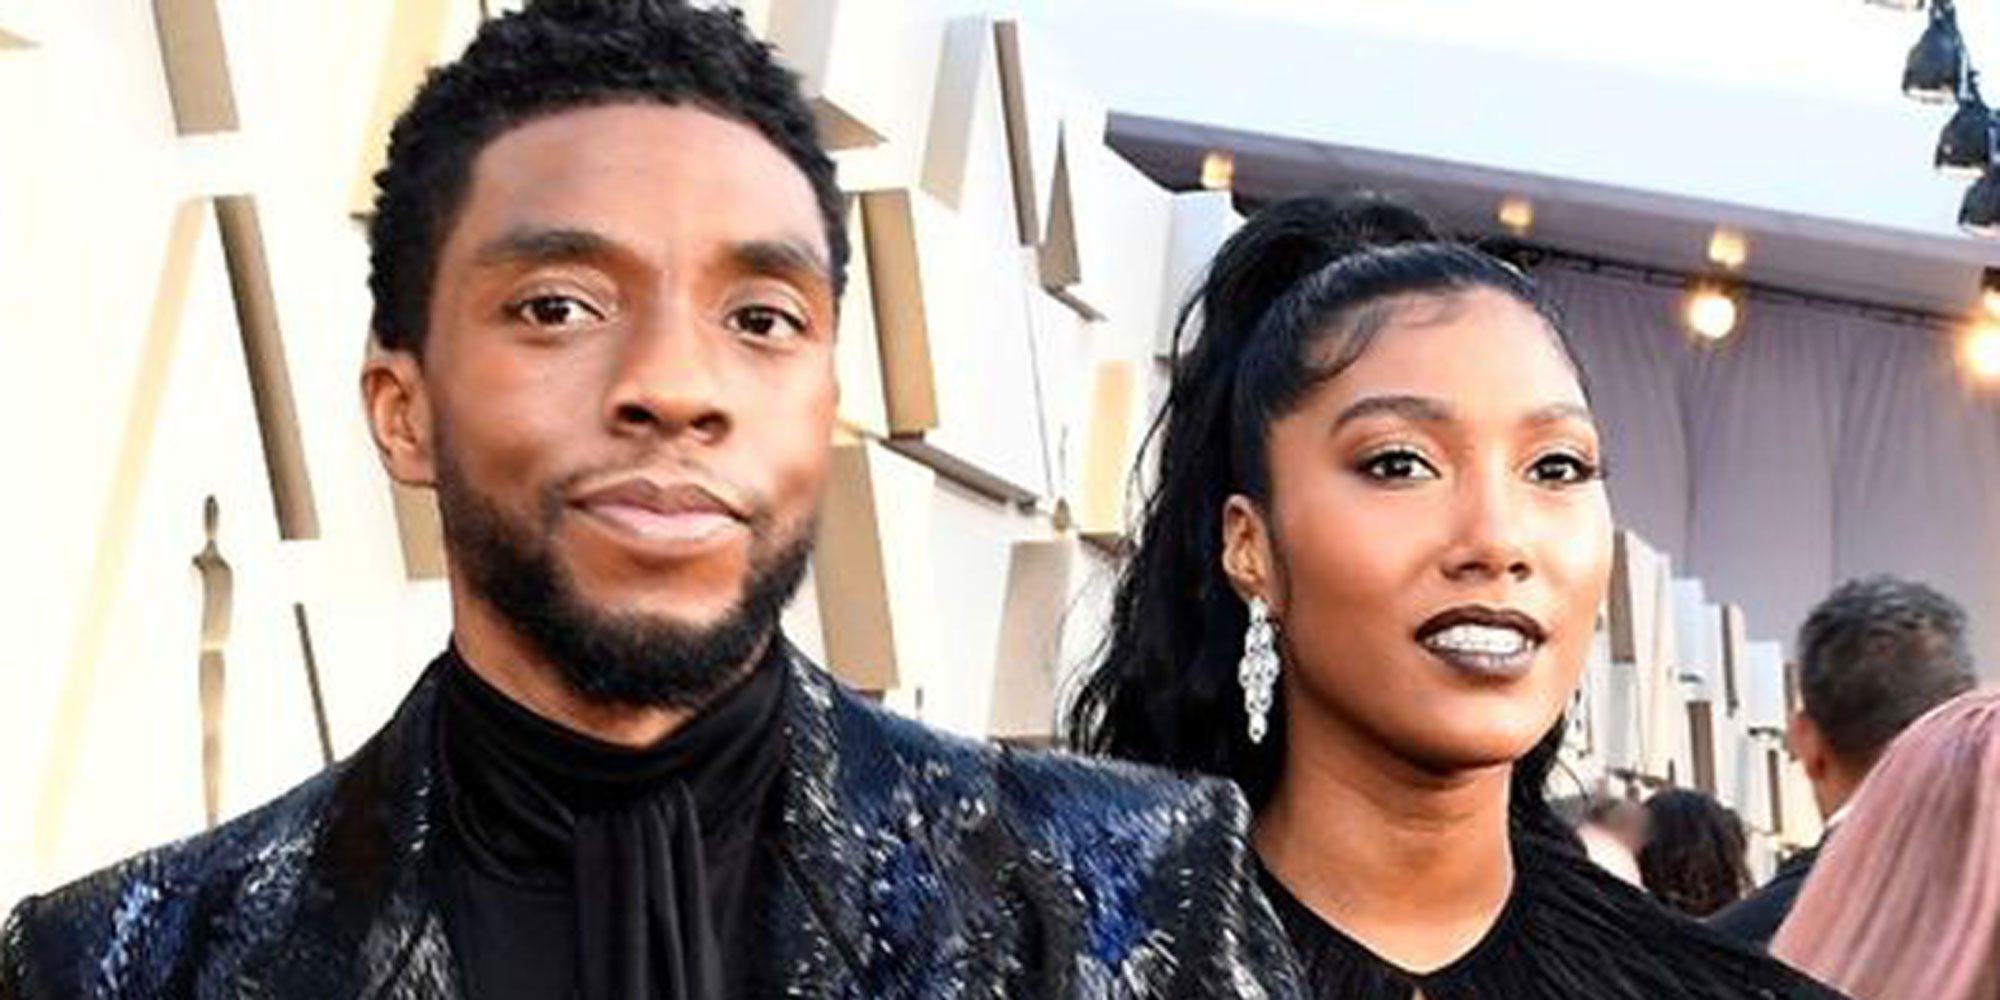 Chadwick Boseman se casó poco antes de morir: Así fue su discreta relación con Taylor Simone Ledward